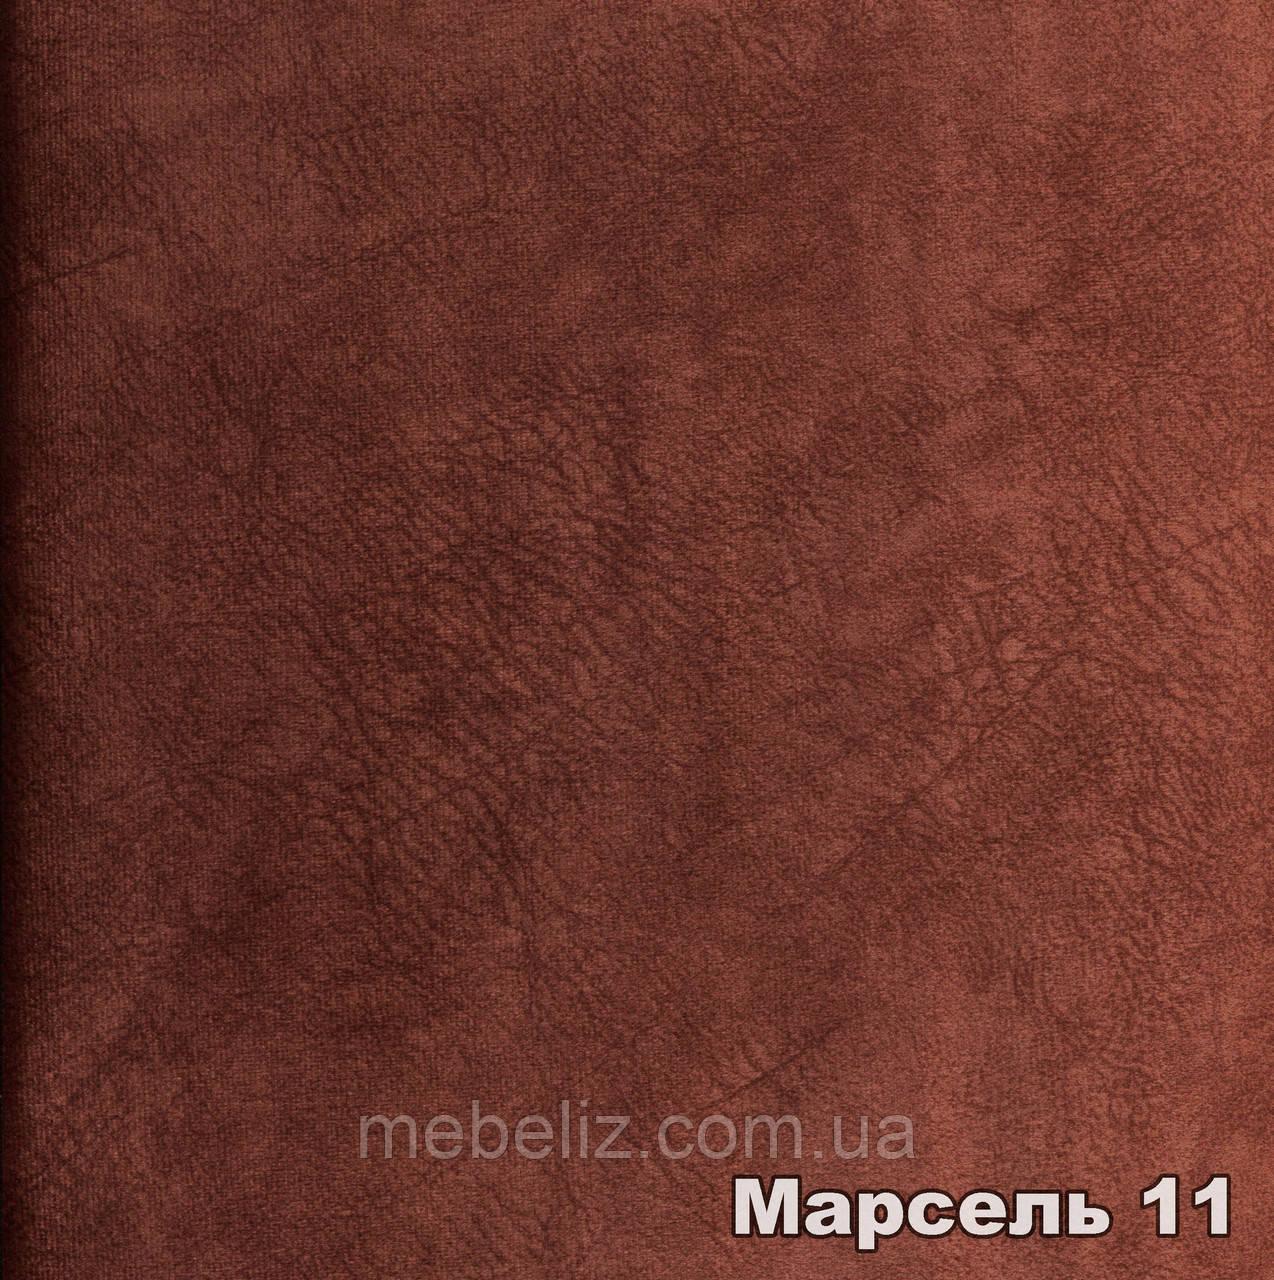 Ткань мебельная обивочная Марсель 11